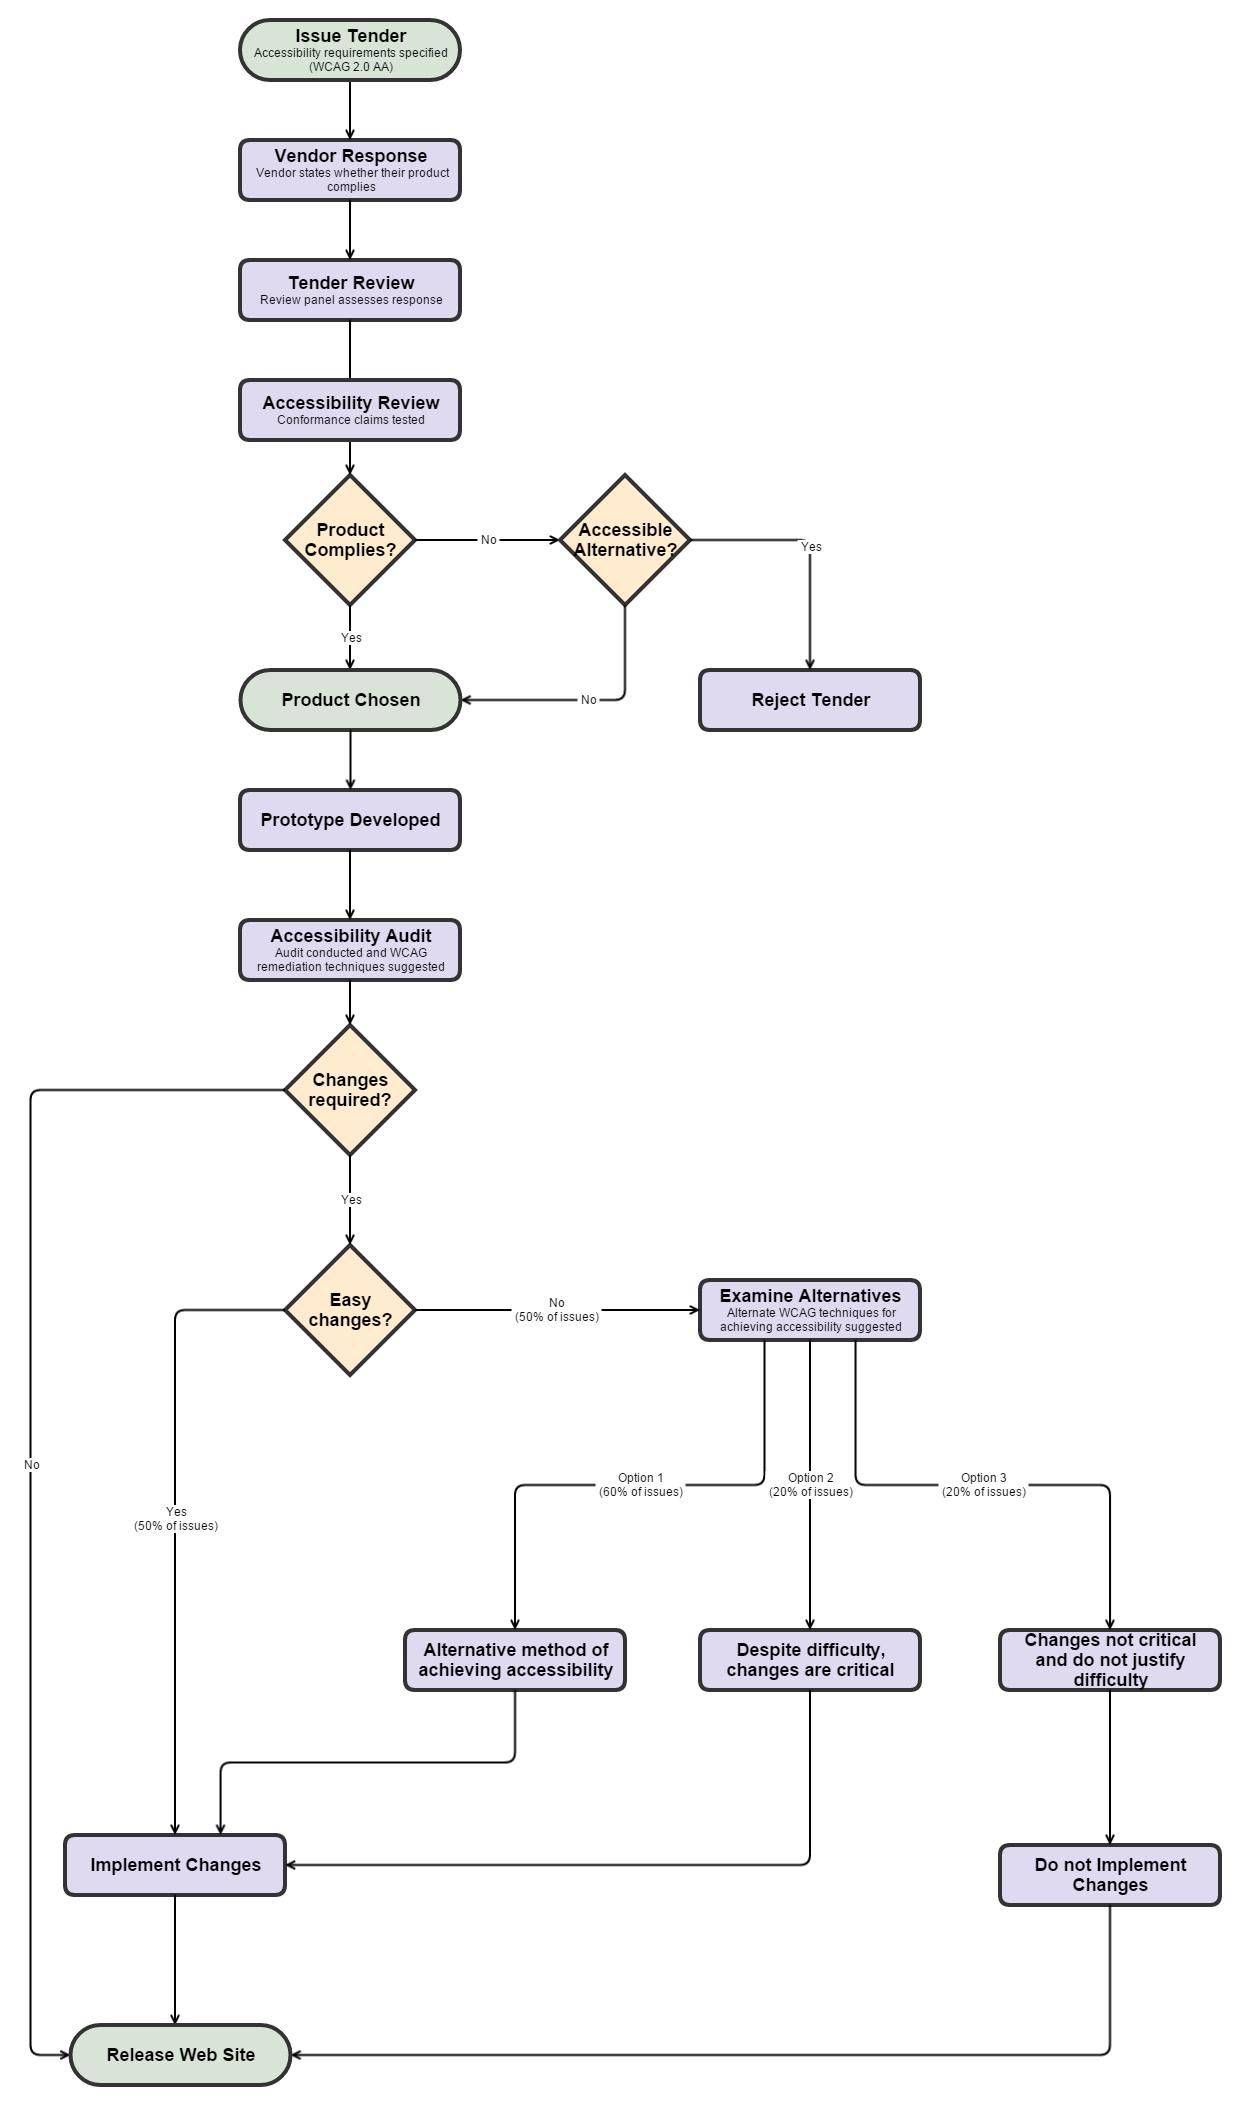 Tender evaluation decision making flowchart